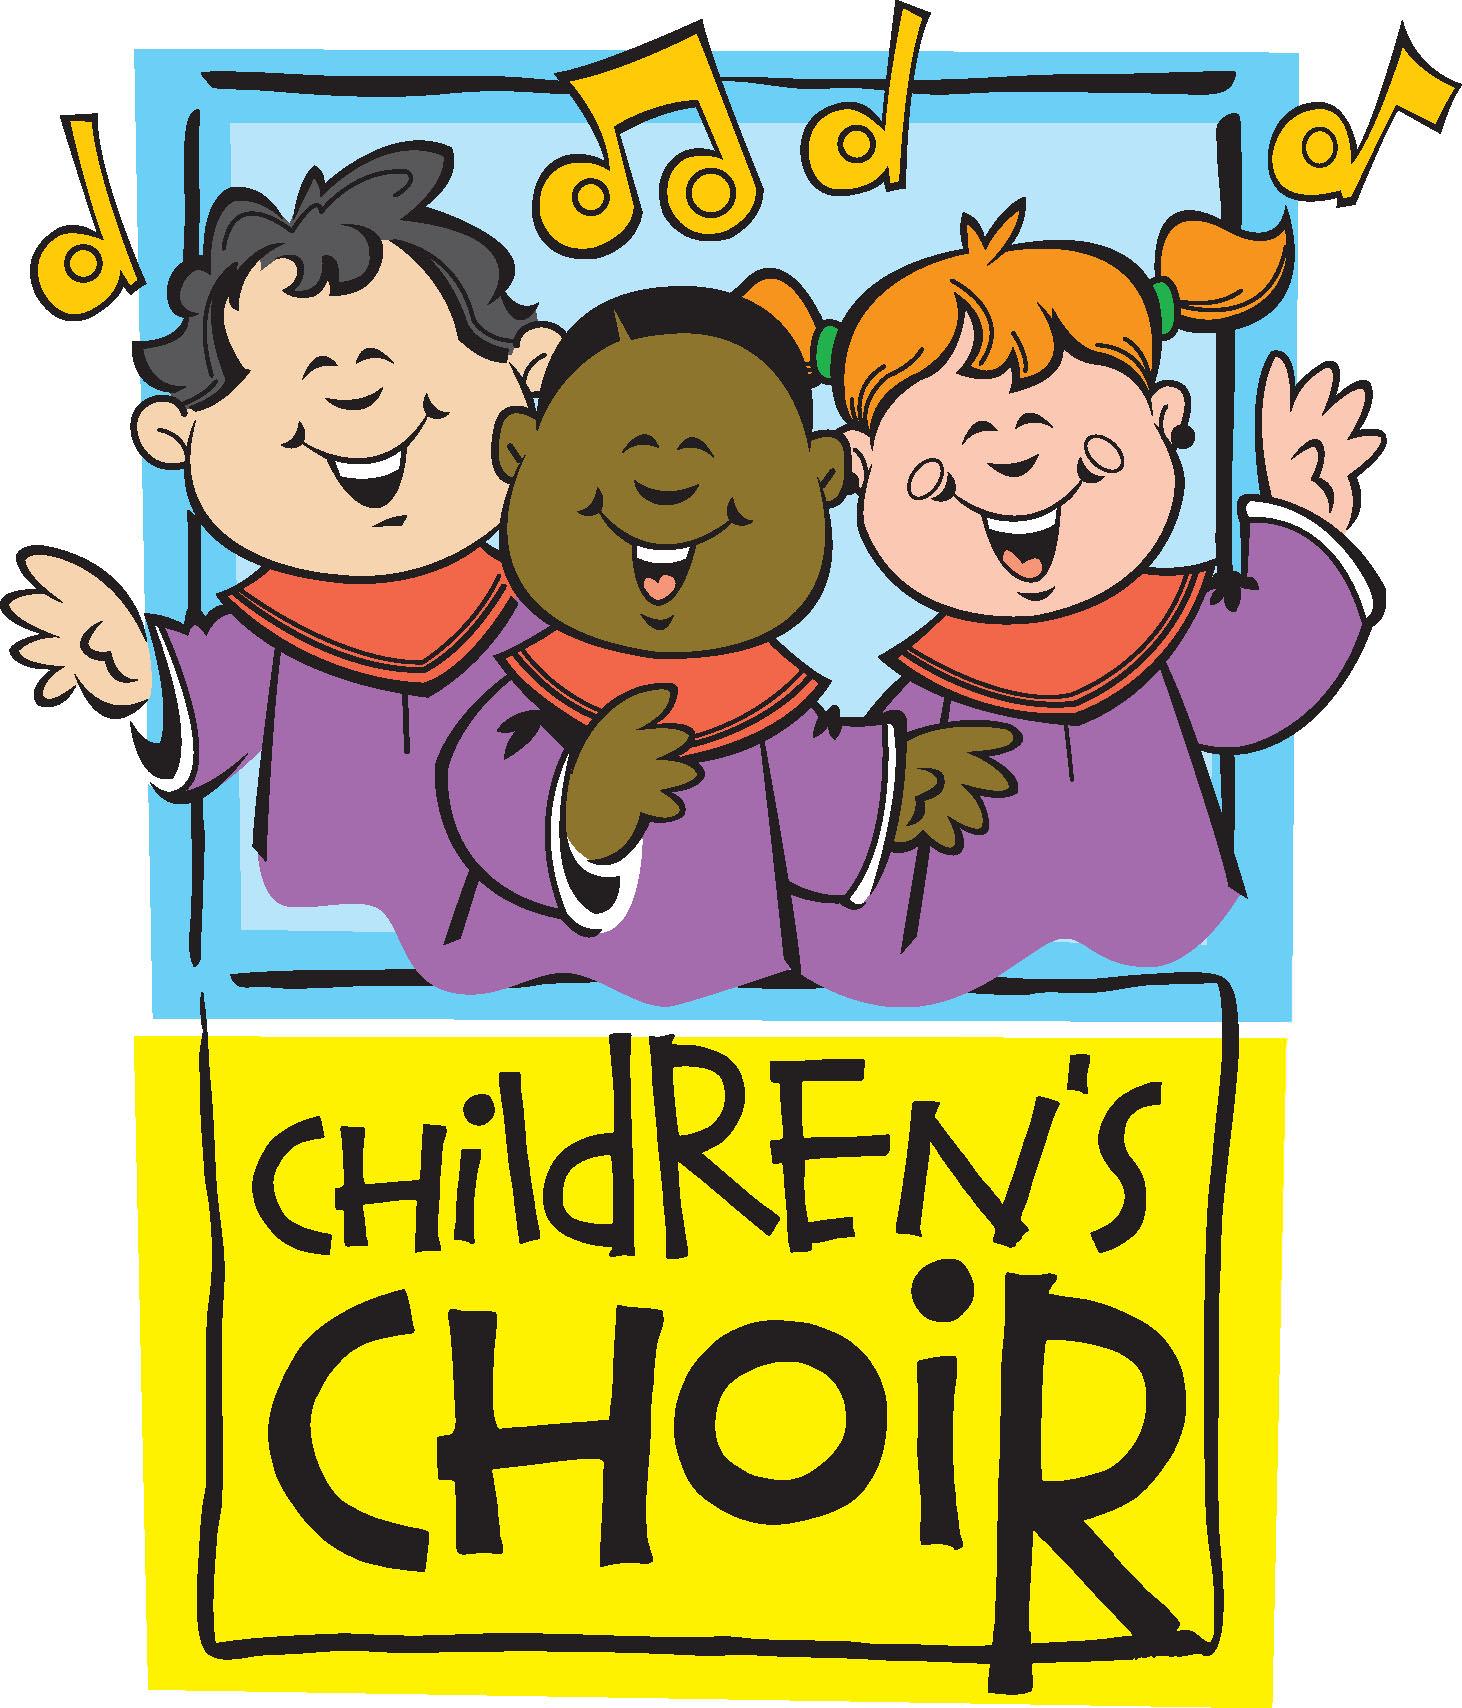 Chorus clipart youth choir. Children s kickoff reformation